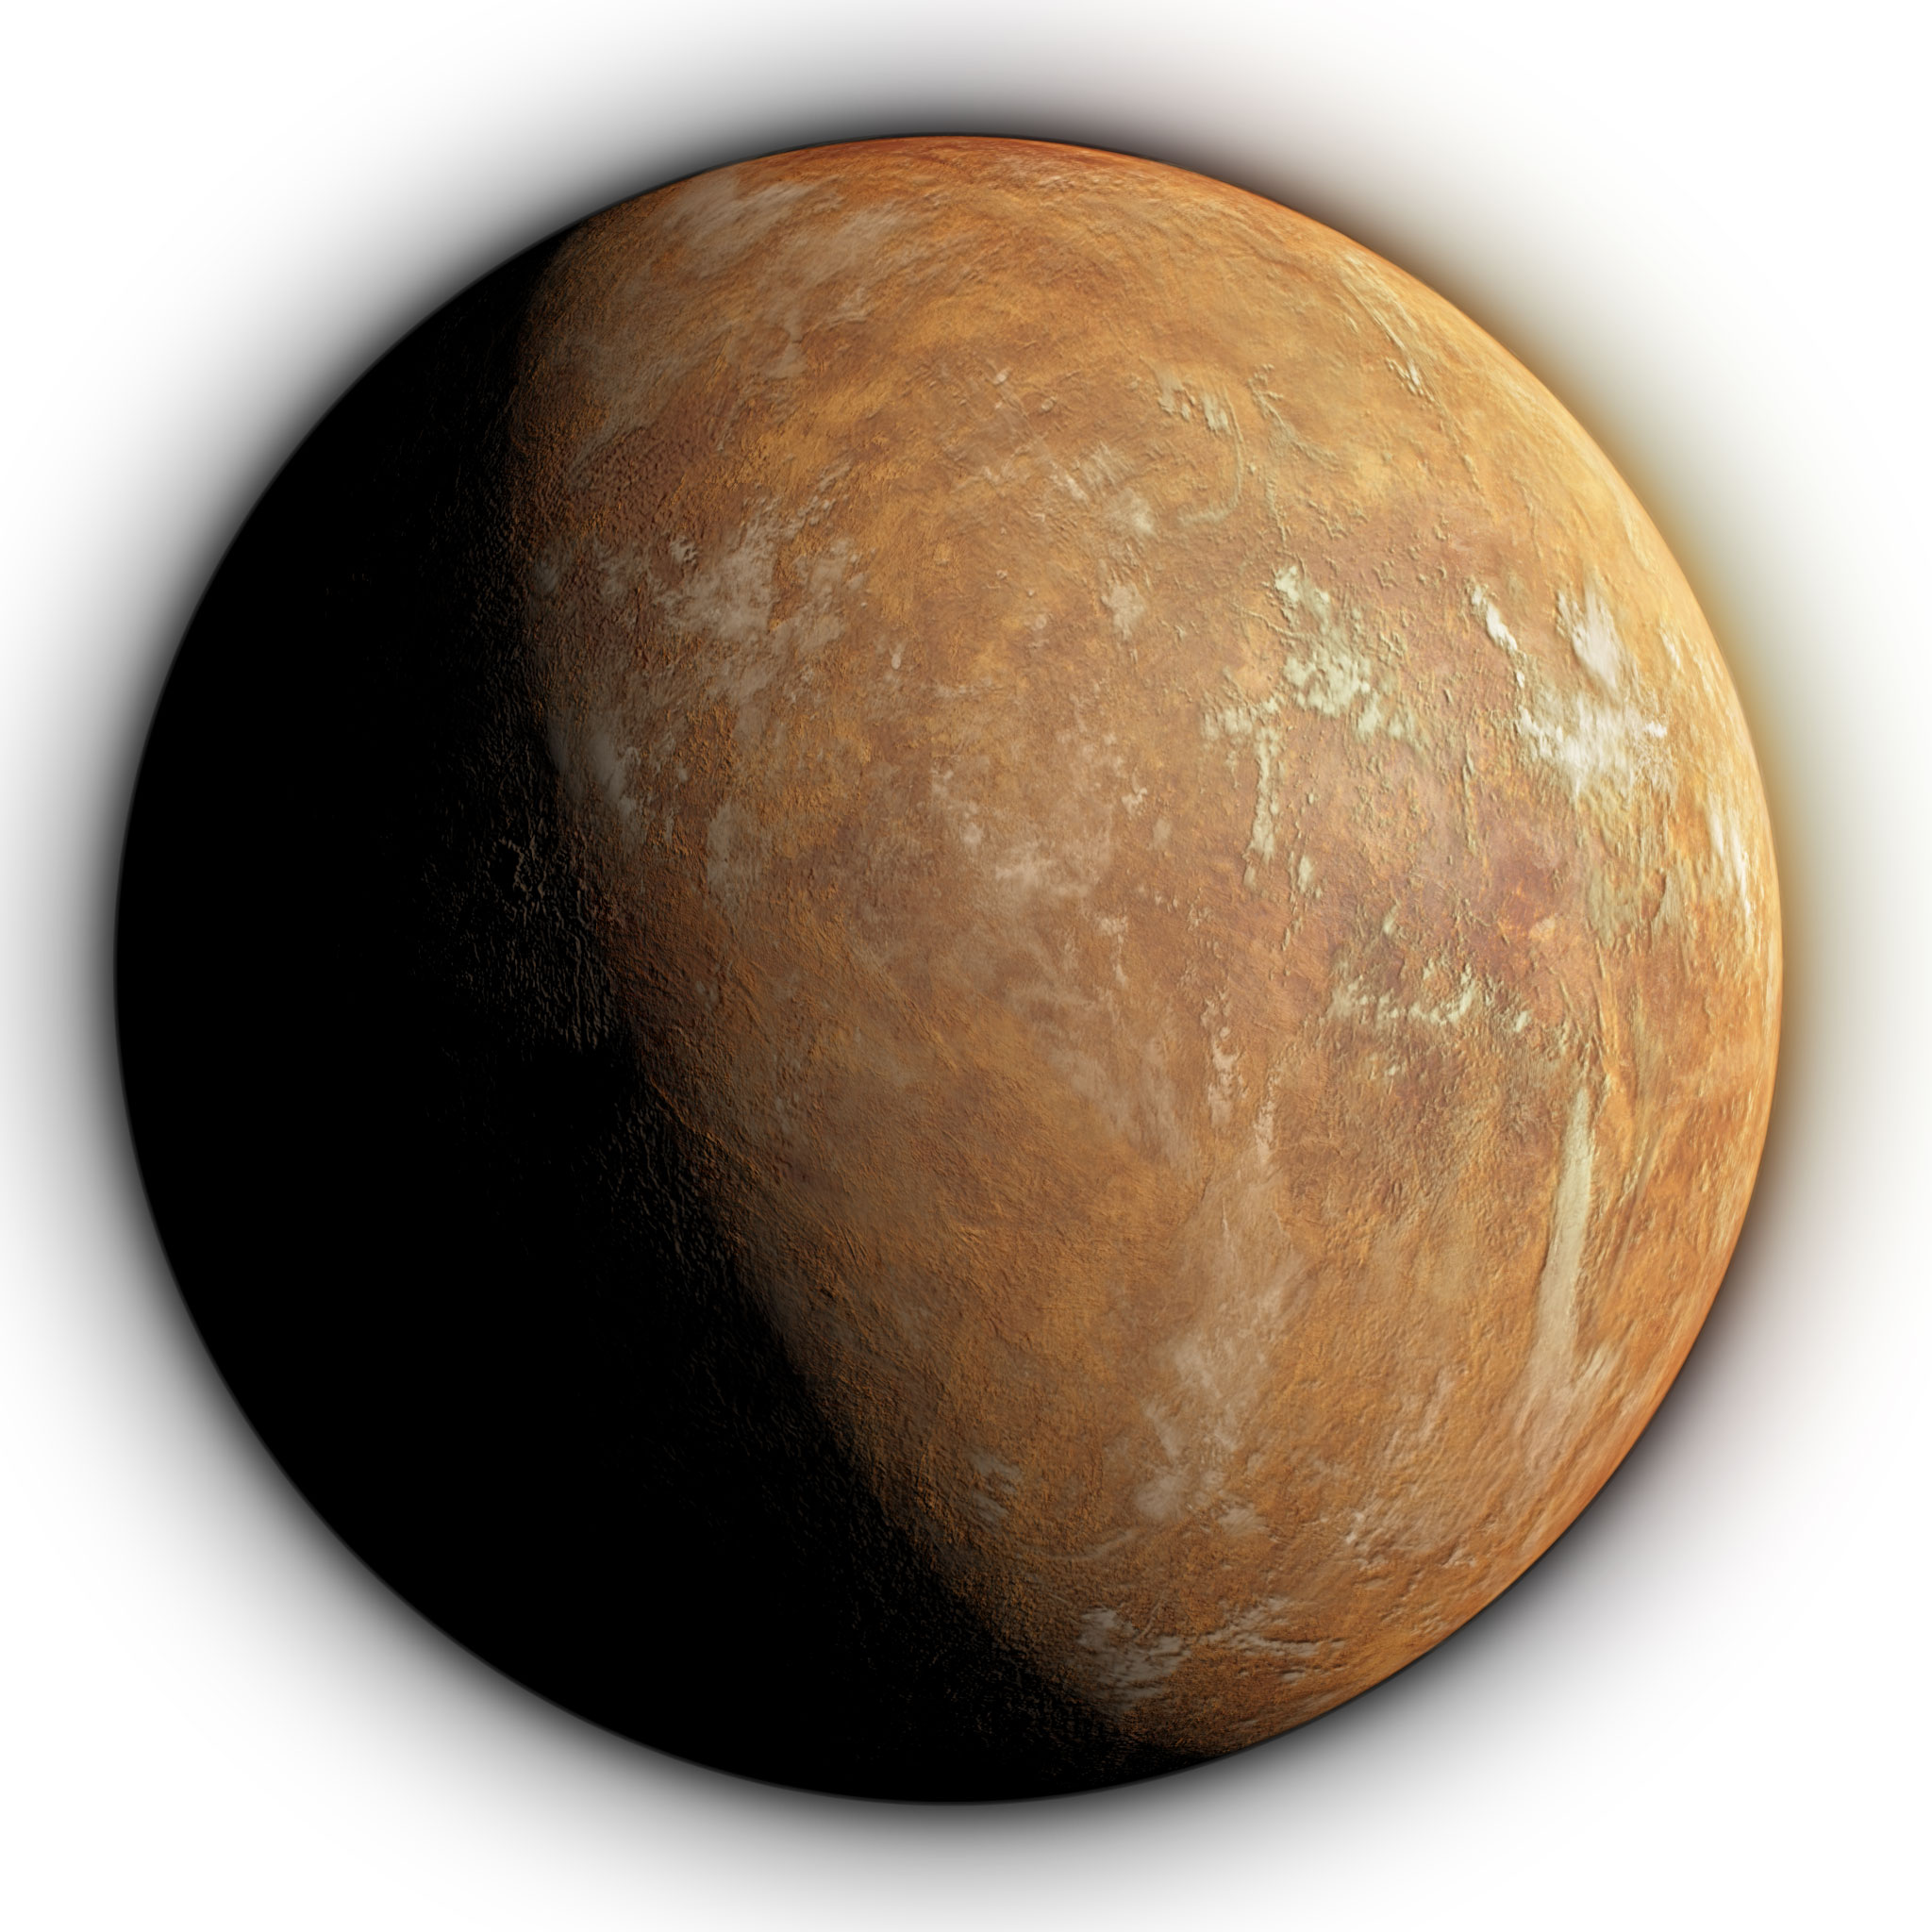 Barnard's Planet